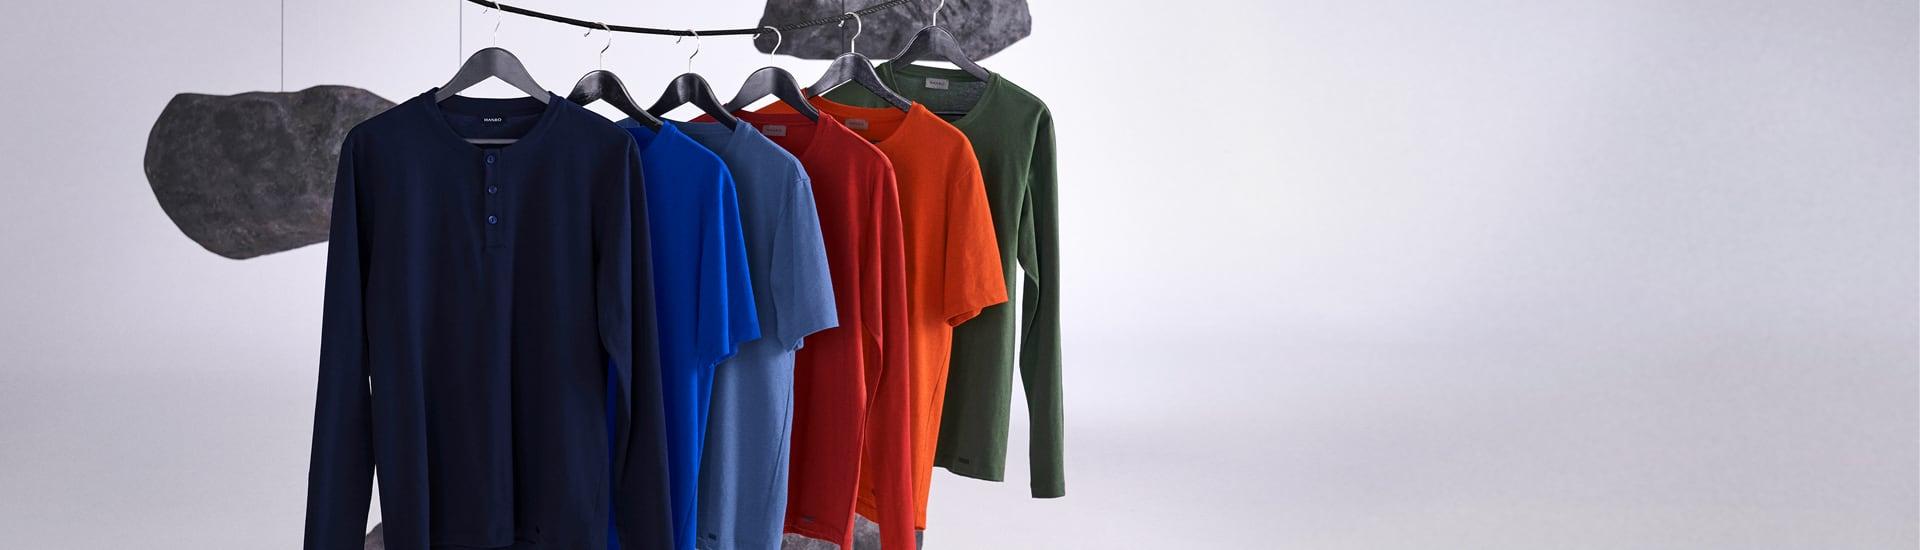 Hanro Herren Shirts Kollektion